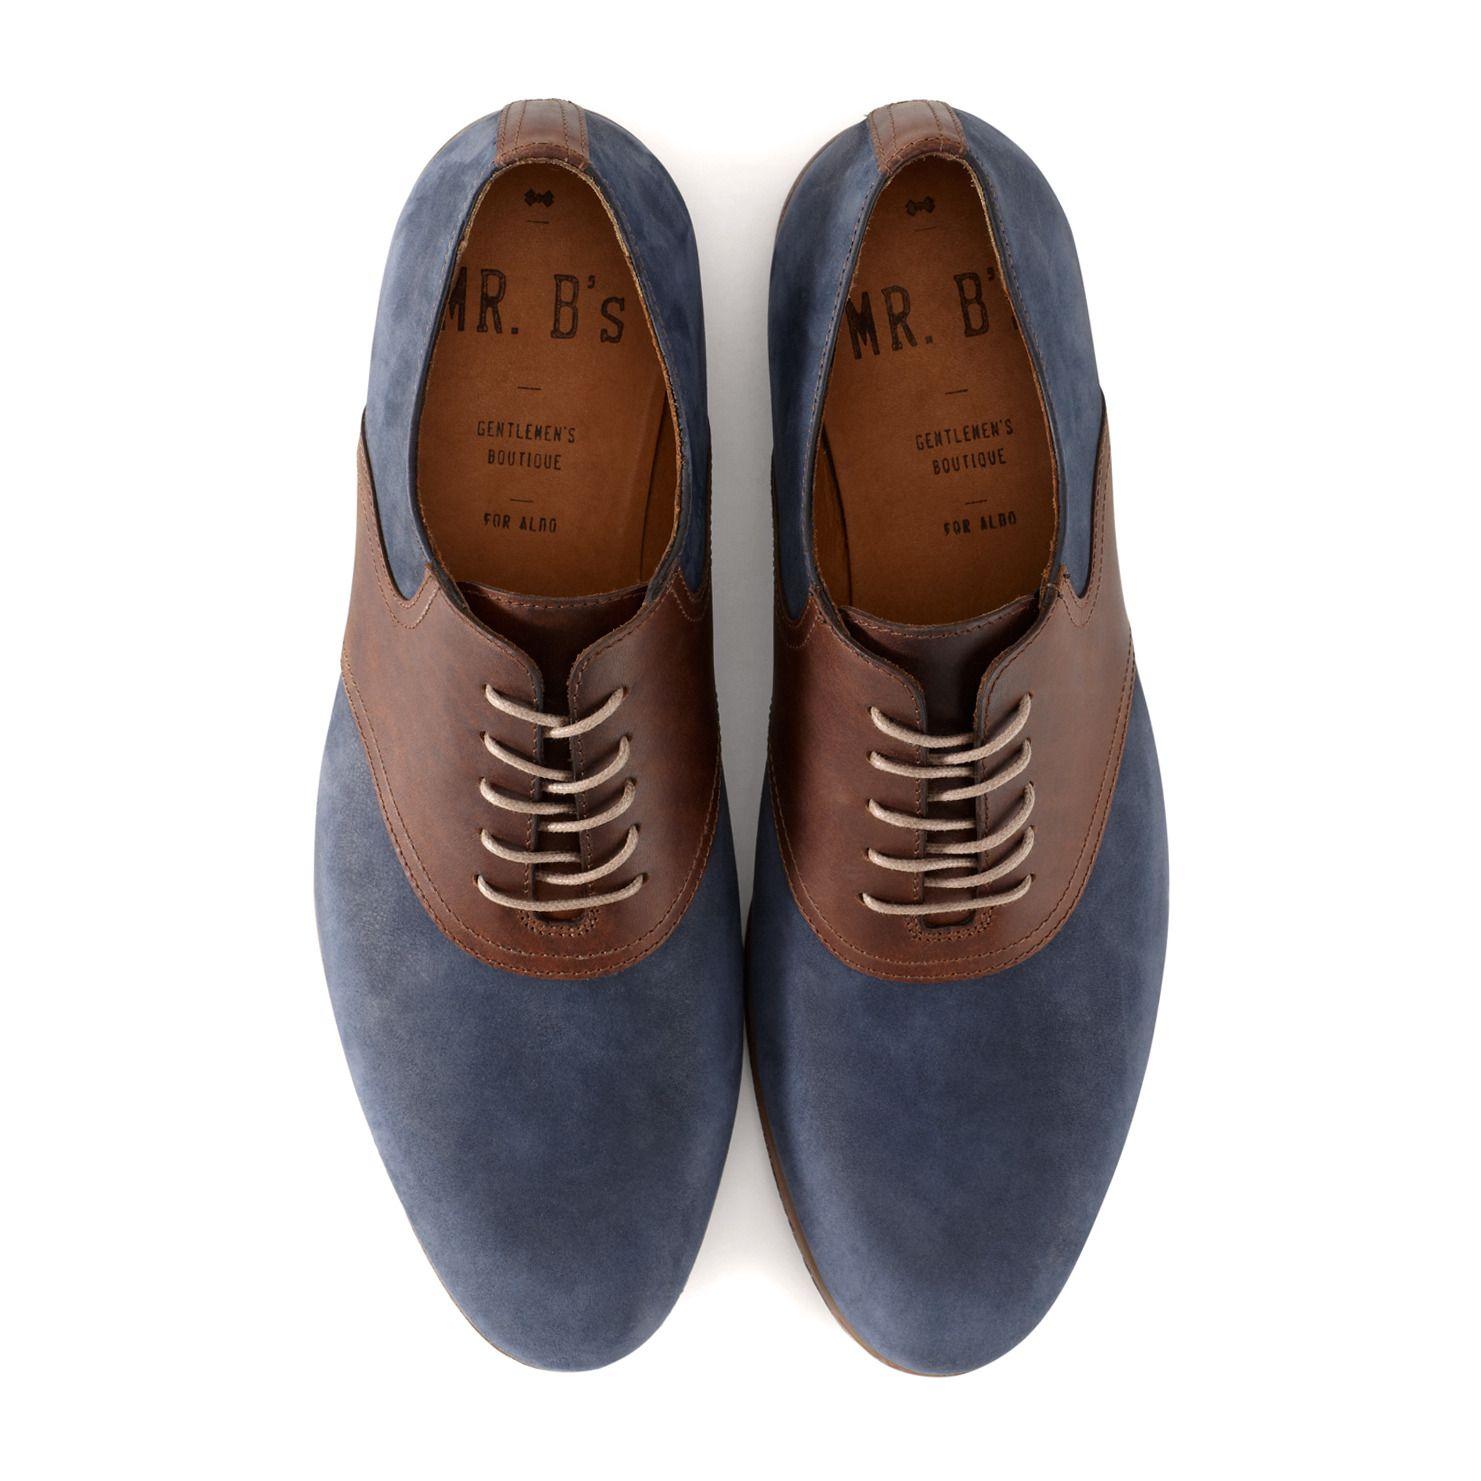 aldo shoes concomitant define